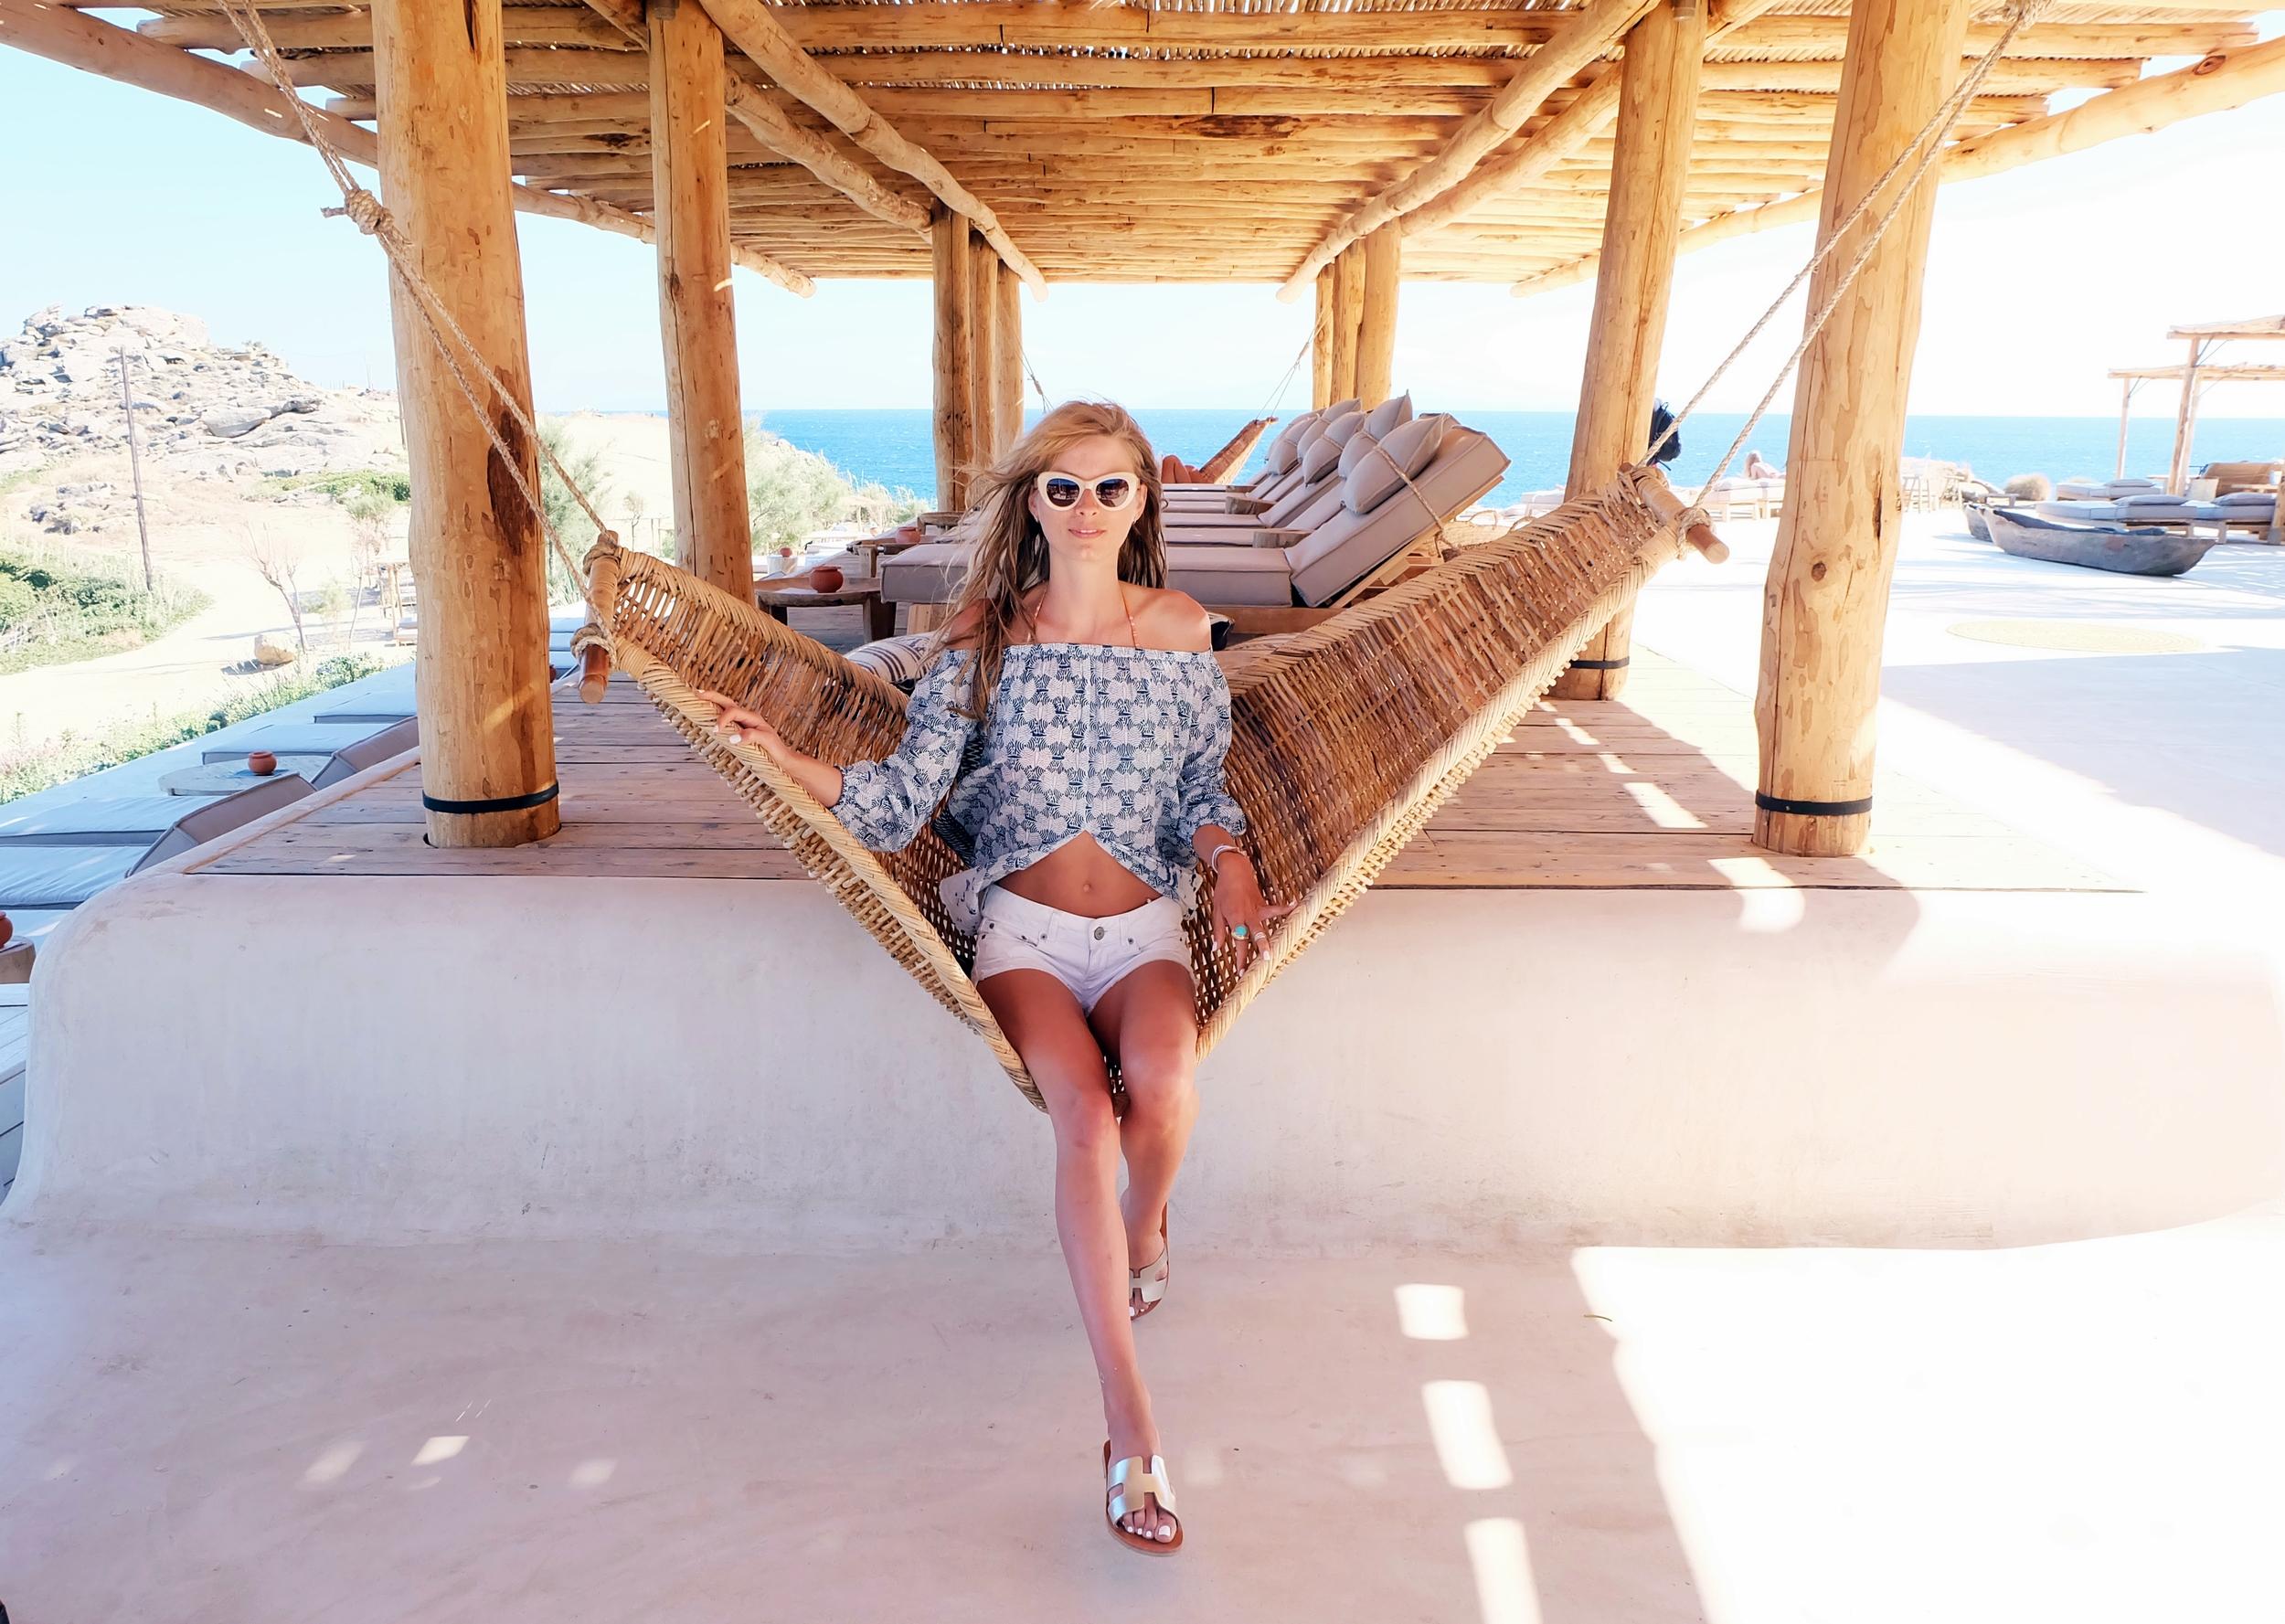 Scorpios beach club (my fave!)